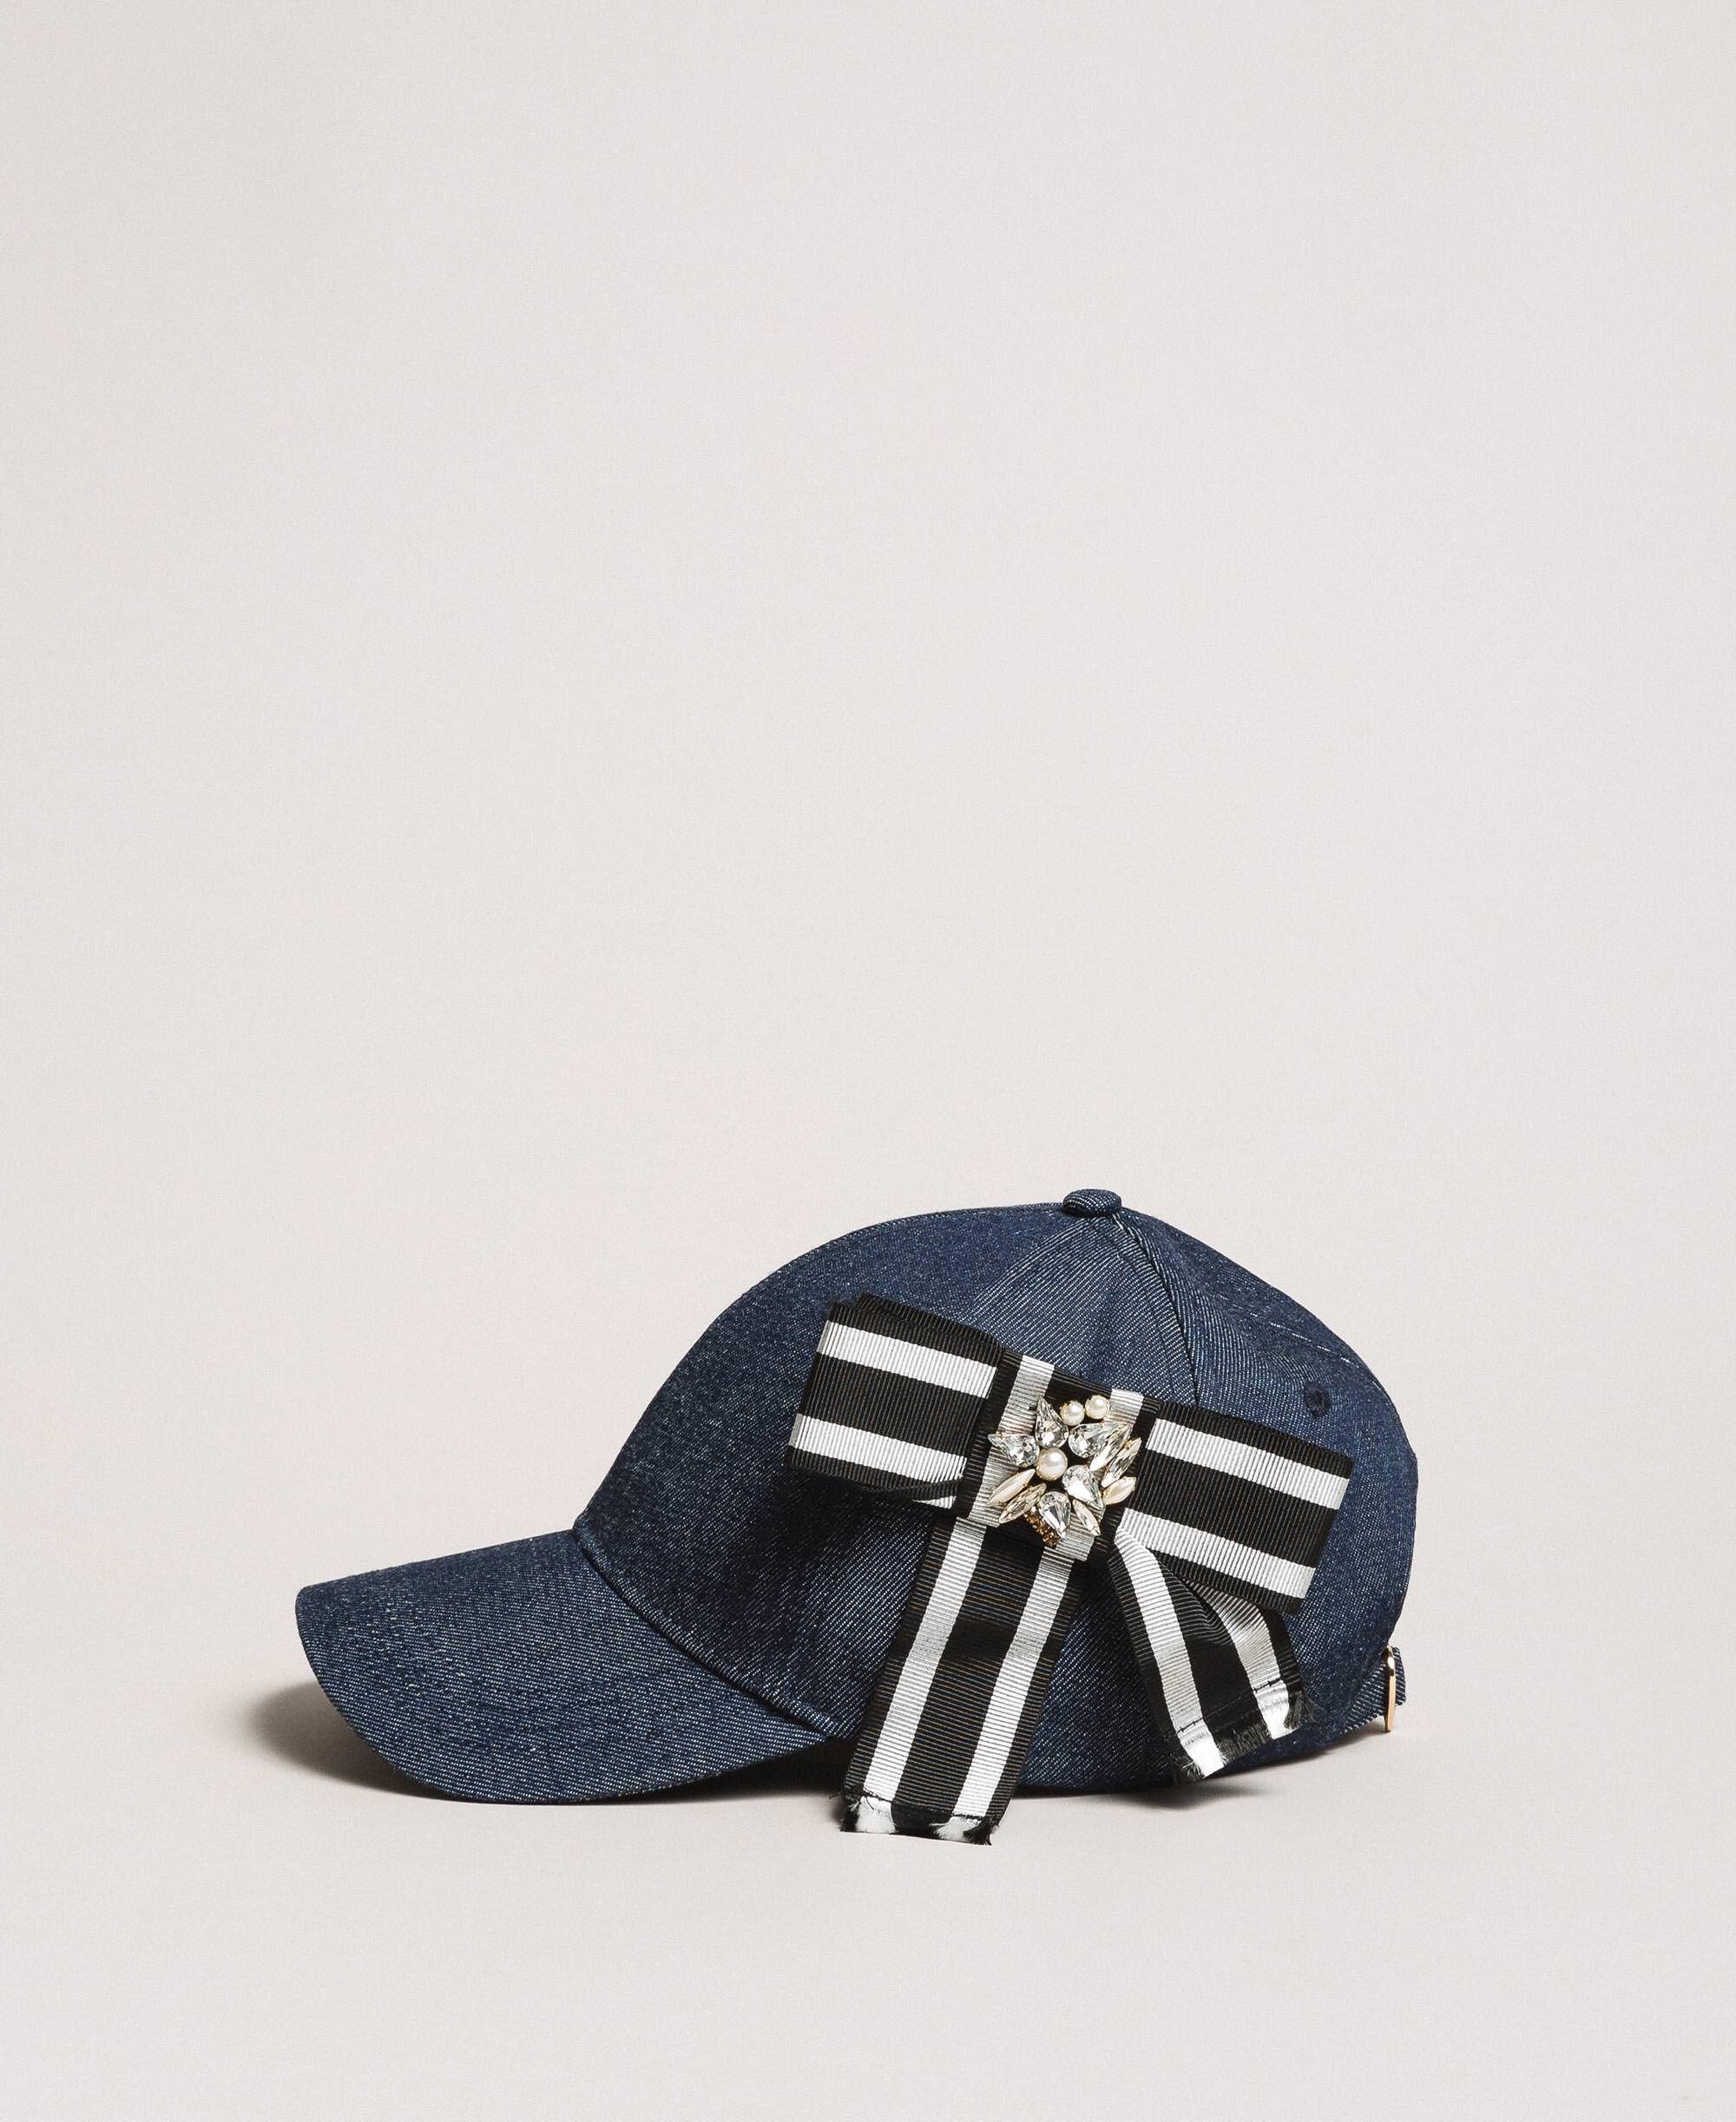 Dk Blue with Butterflys Denim Hats